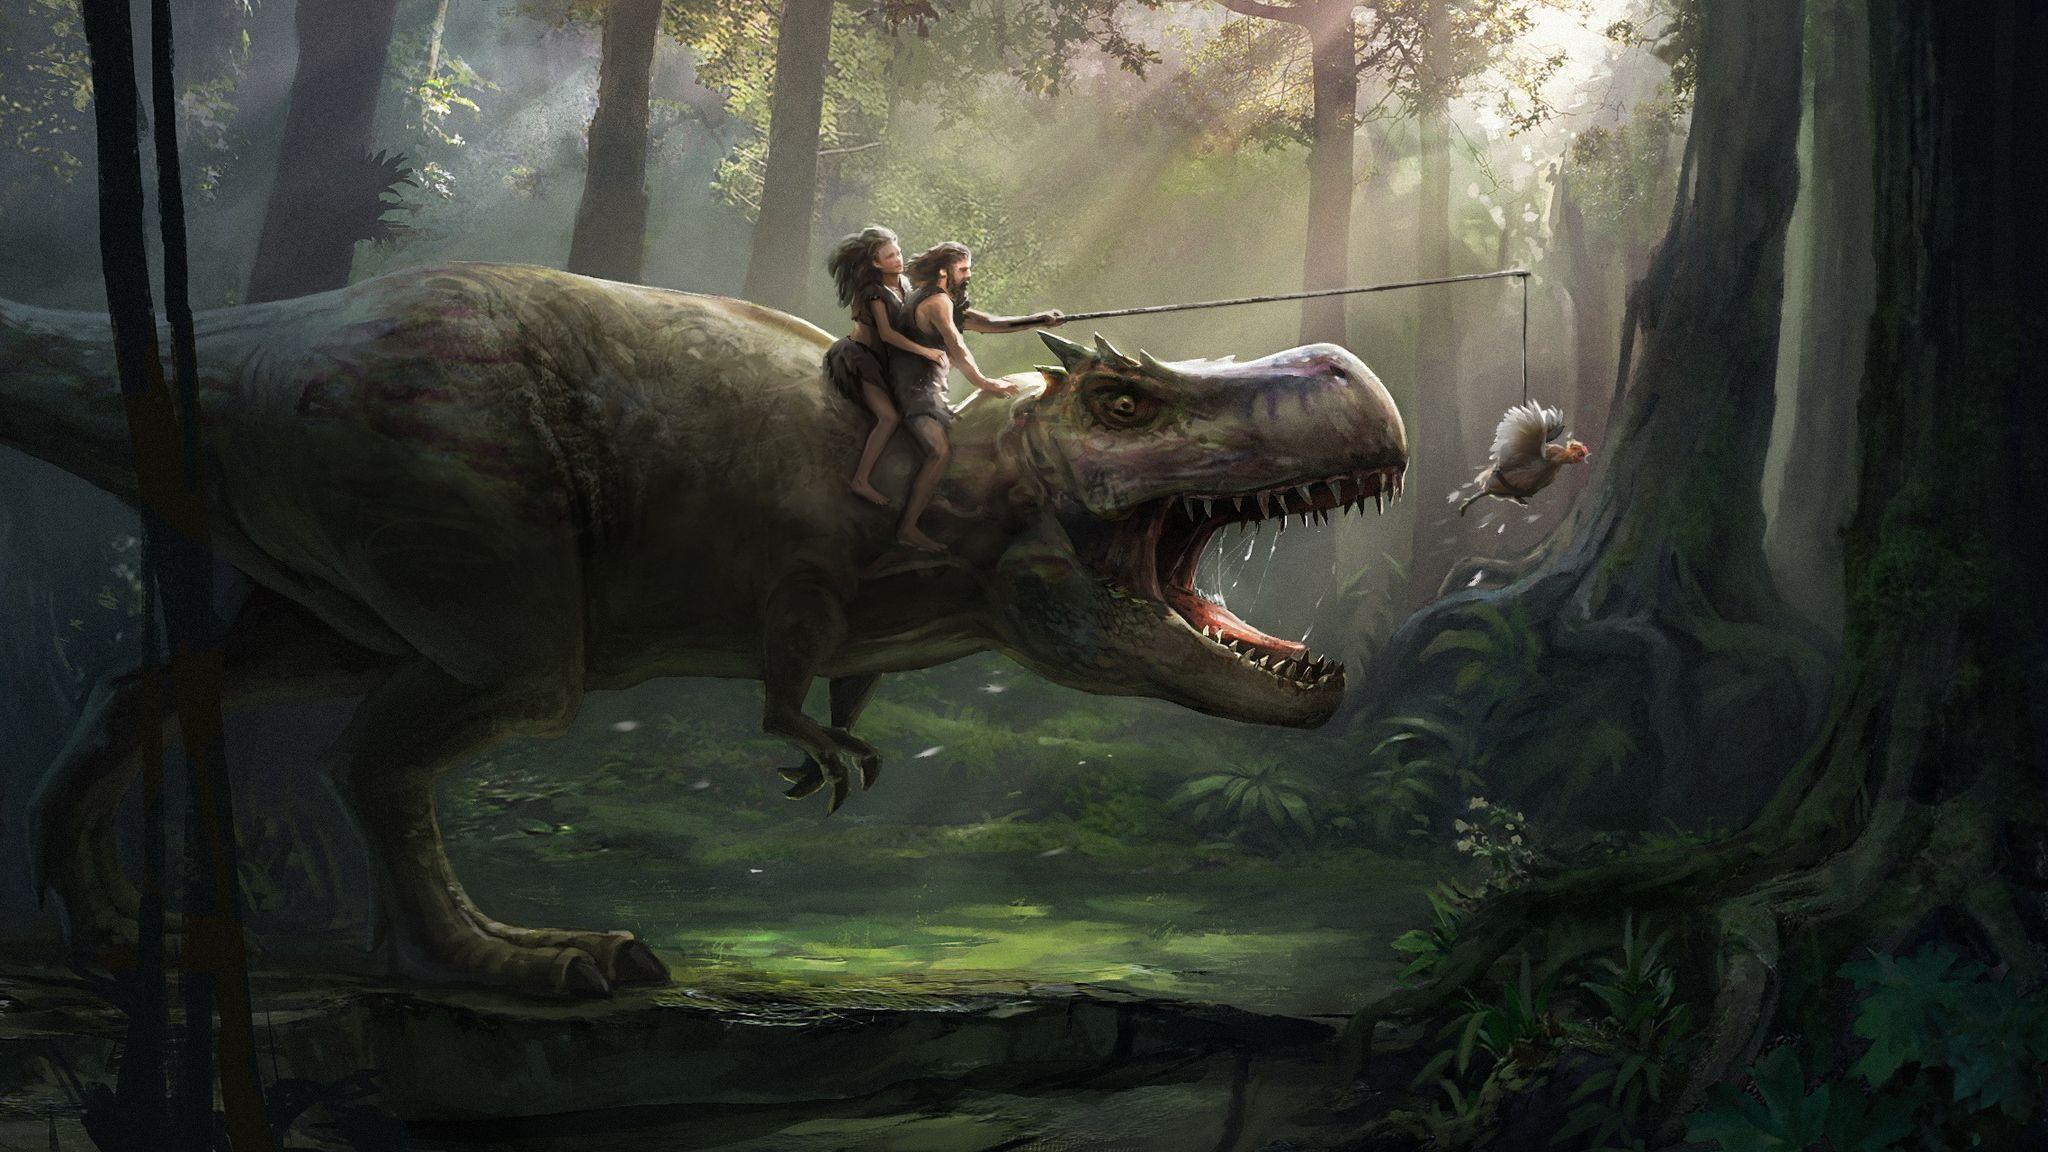 dinasaur picture